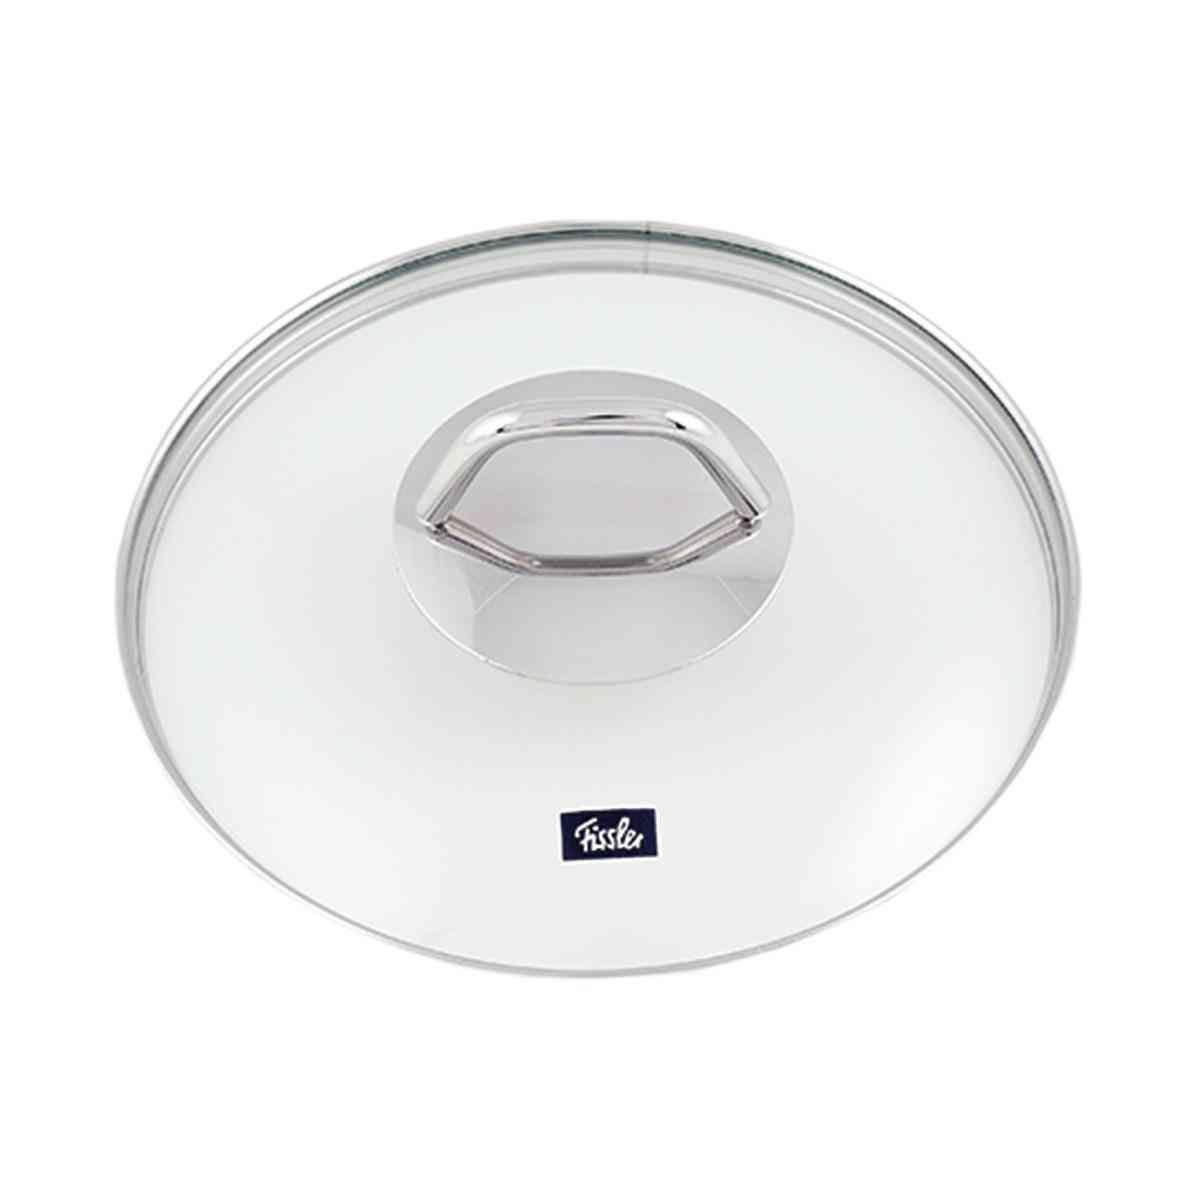 black edition / colonia glass lid 16 cm